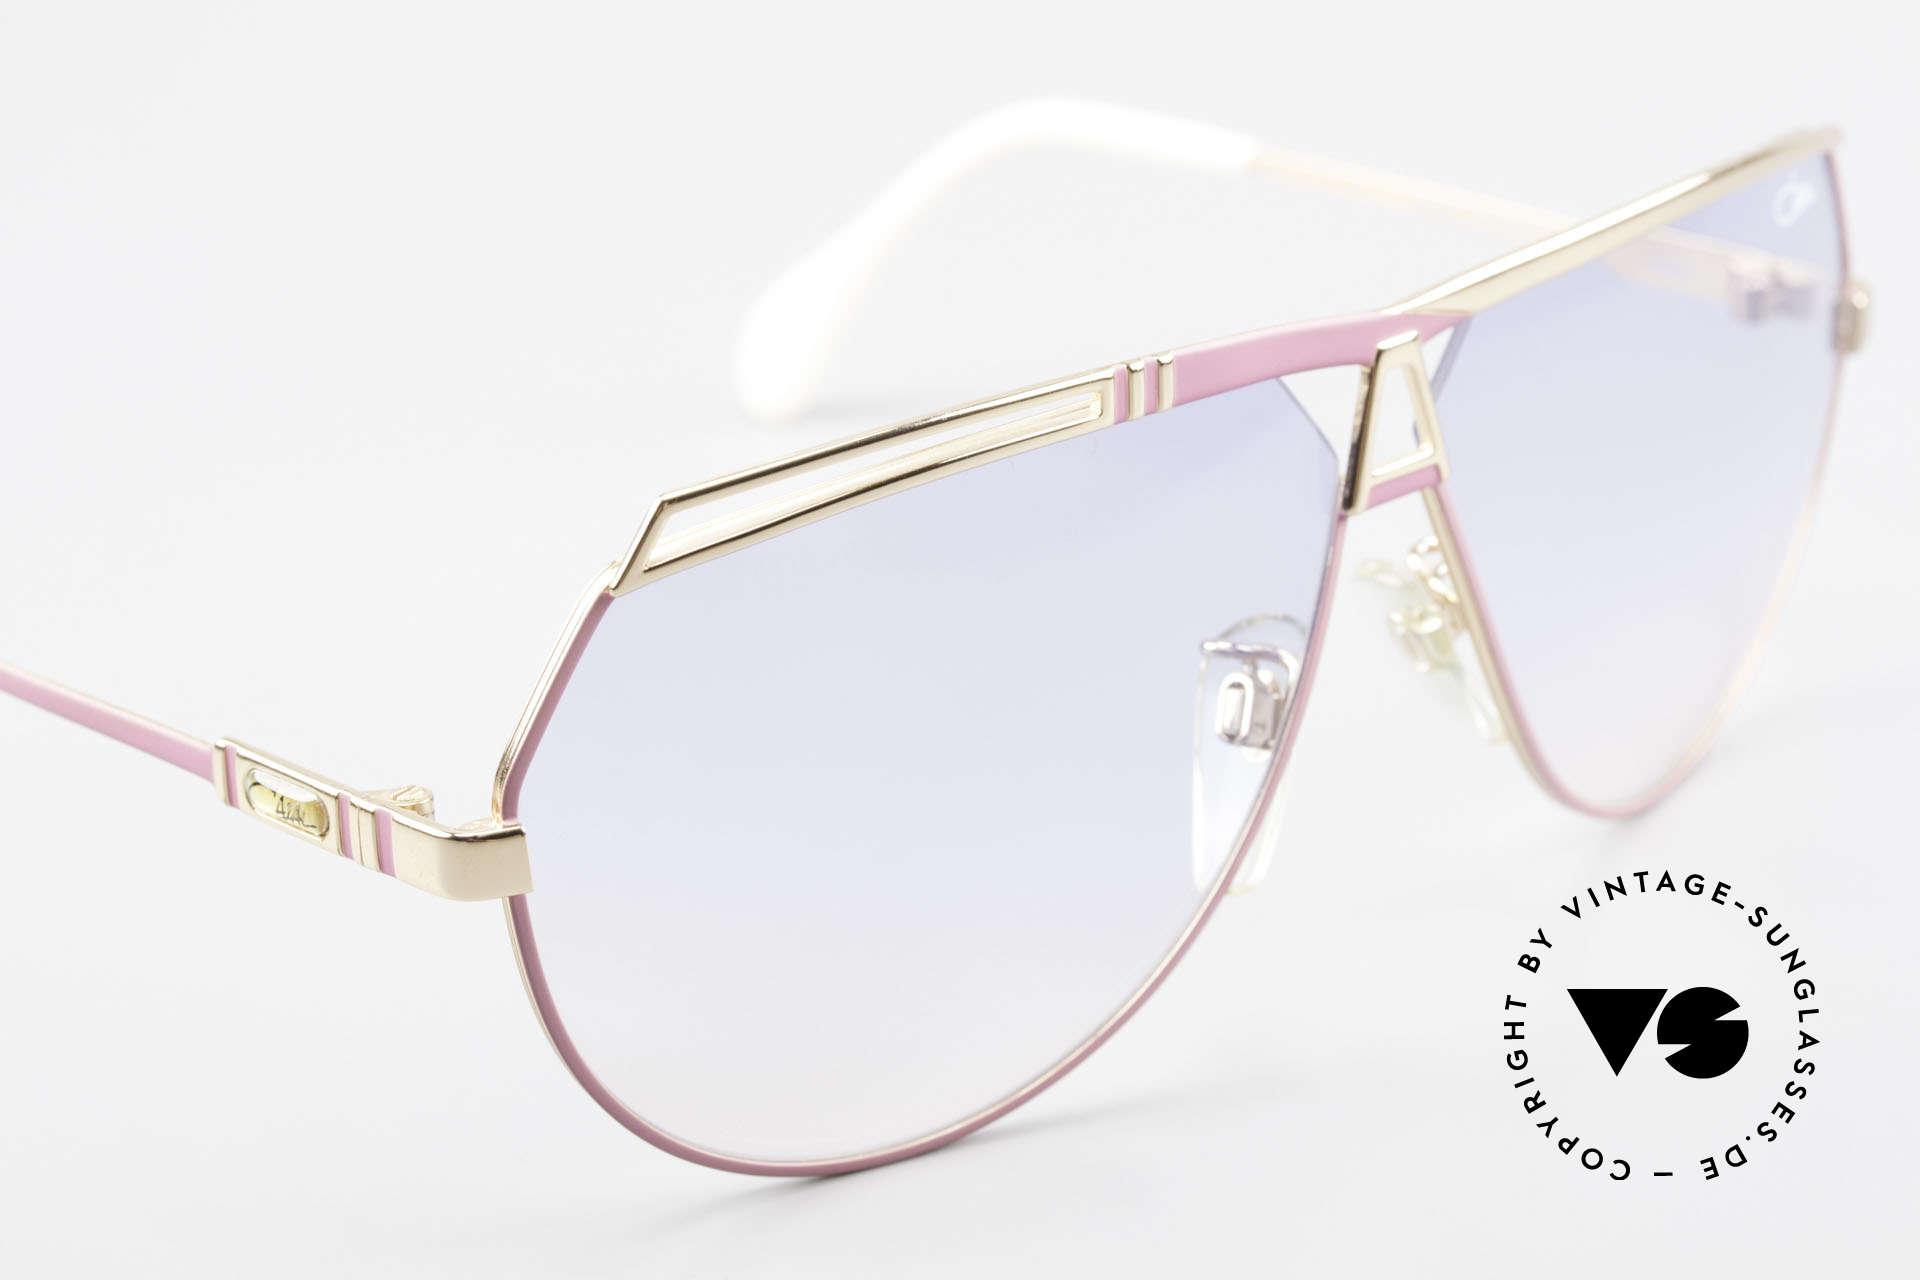 Cazal 954 Oversized 80's Sunglasses, NO RETRO sunglasses, but an old CAZAL original, Made for Women